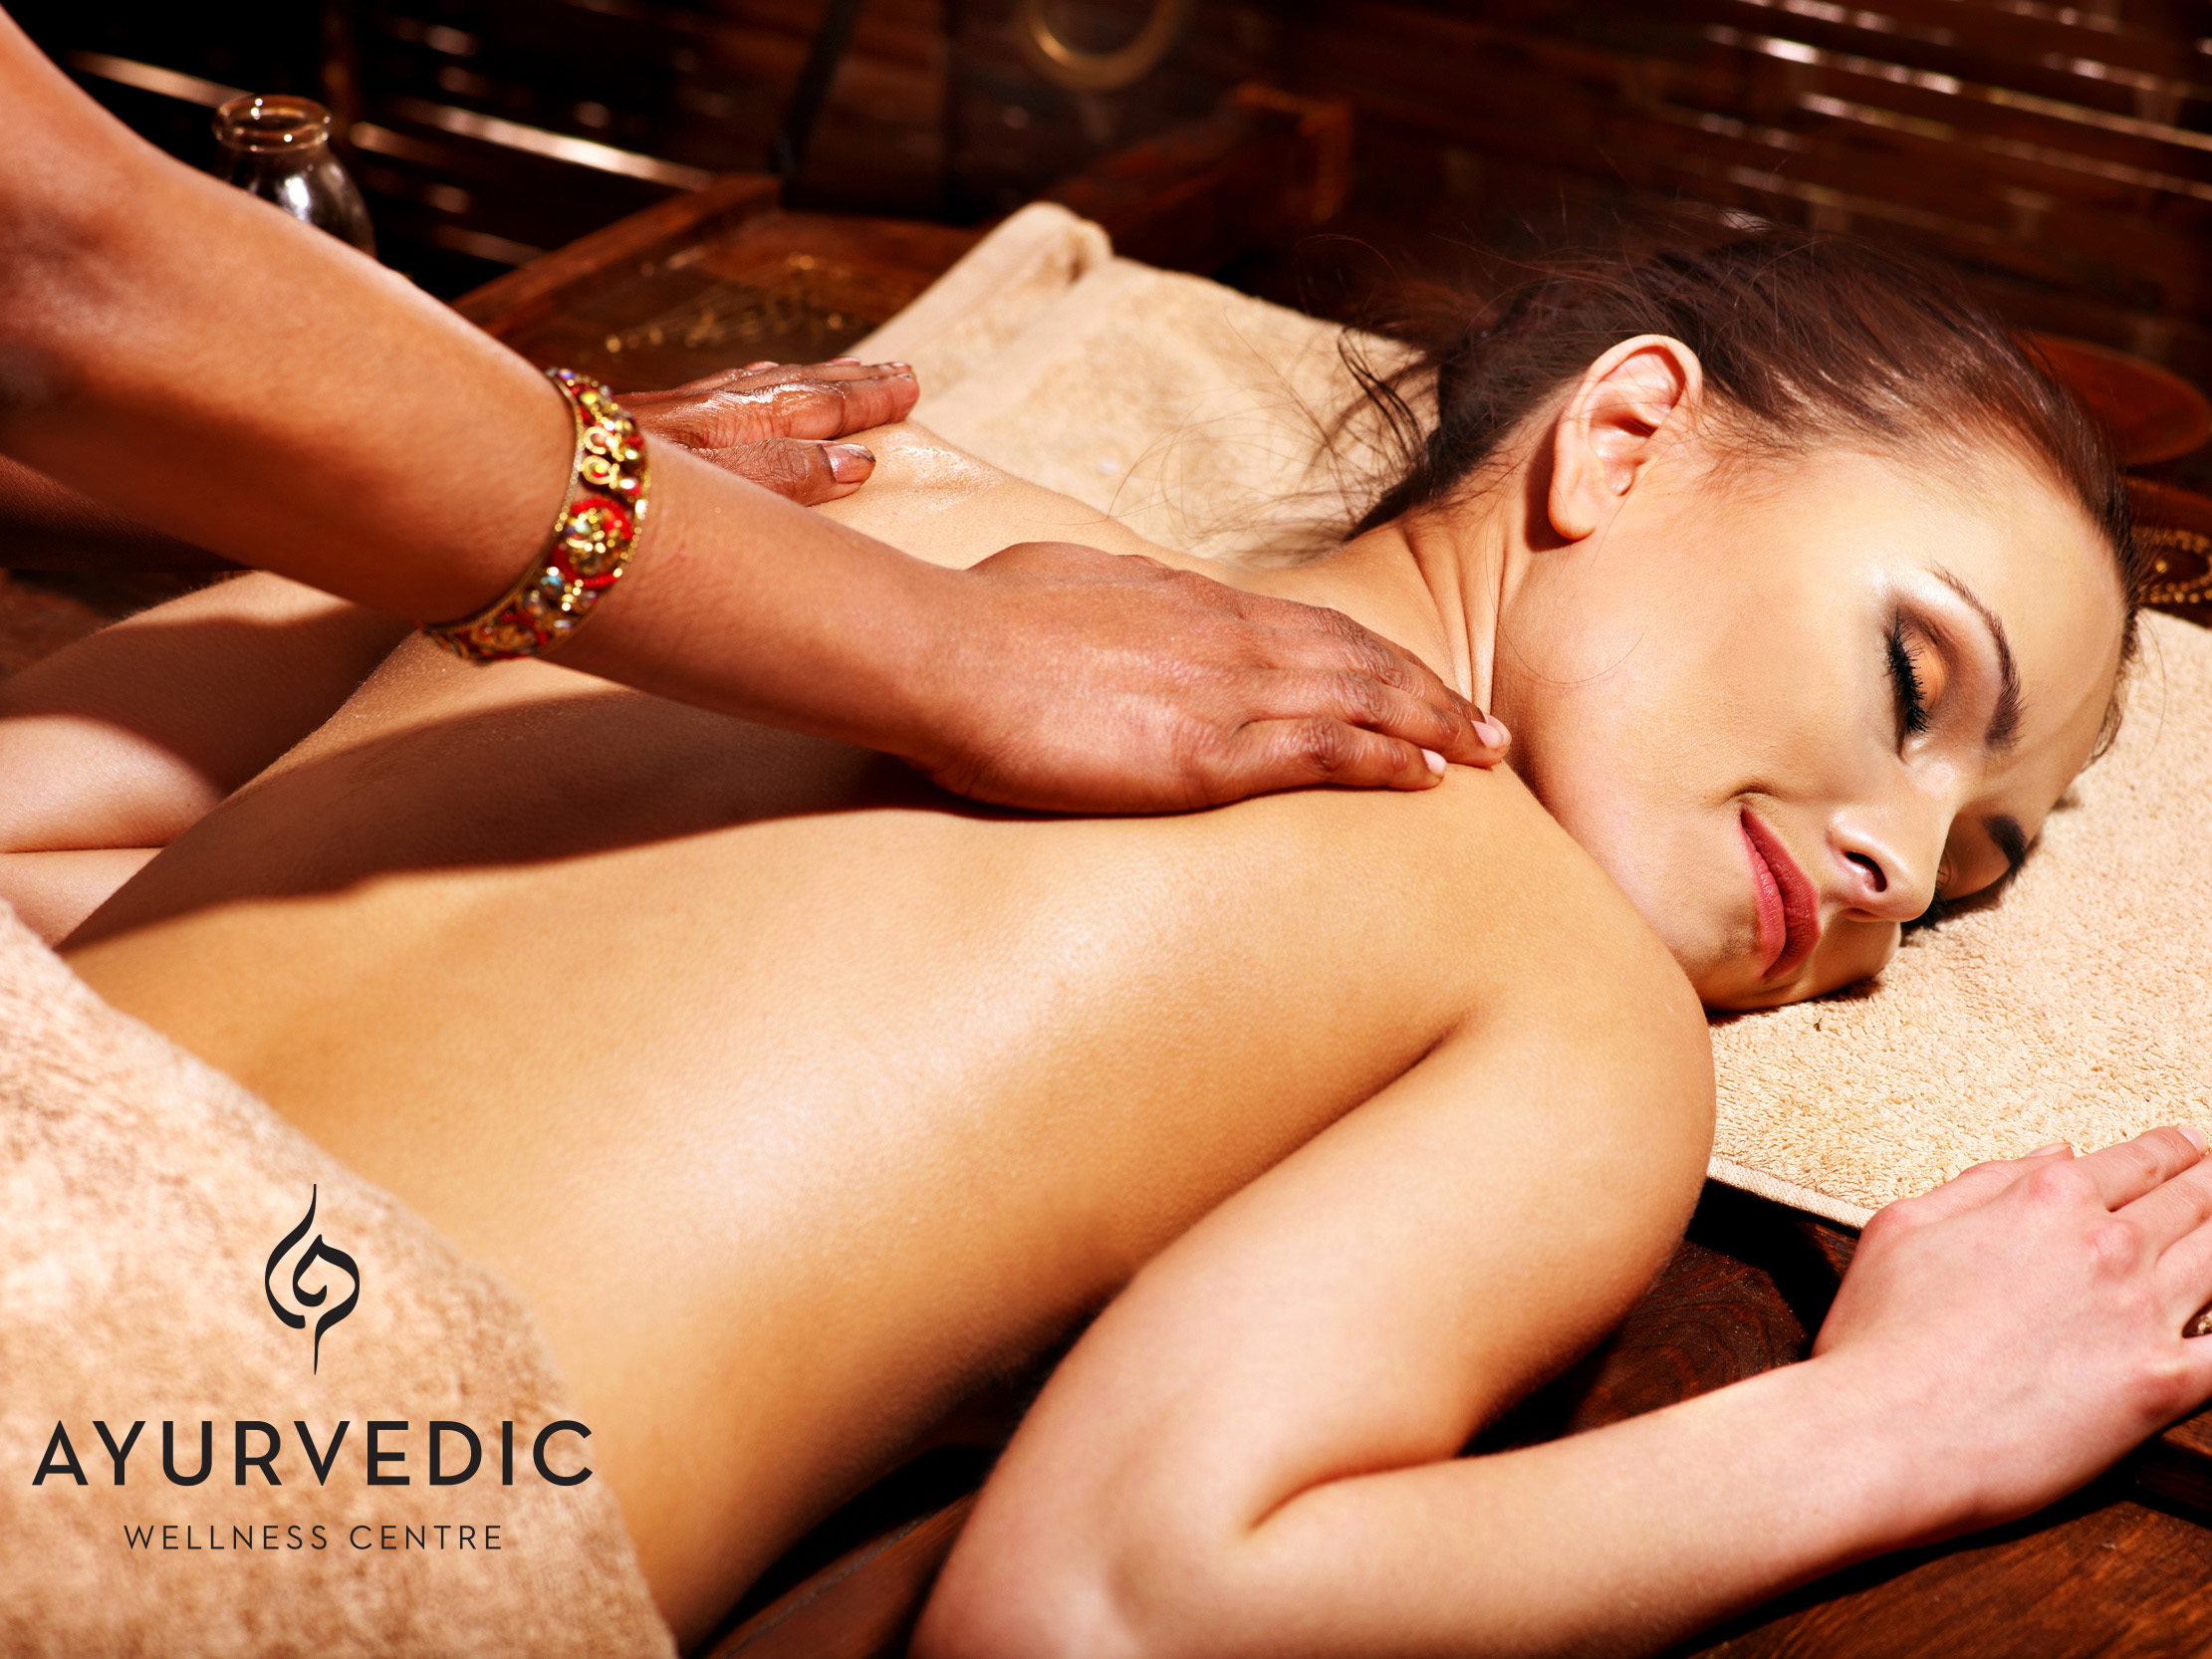 best sensual massage west sydney brothel